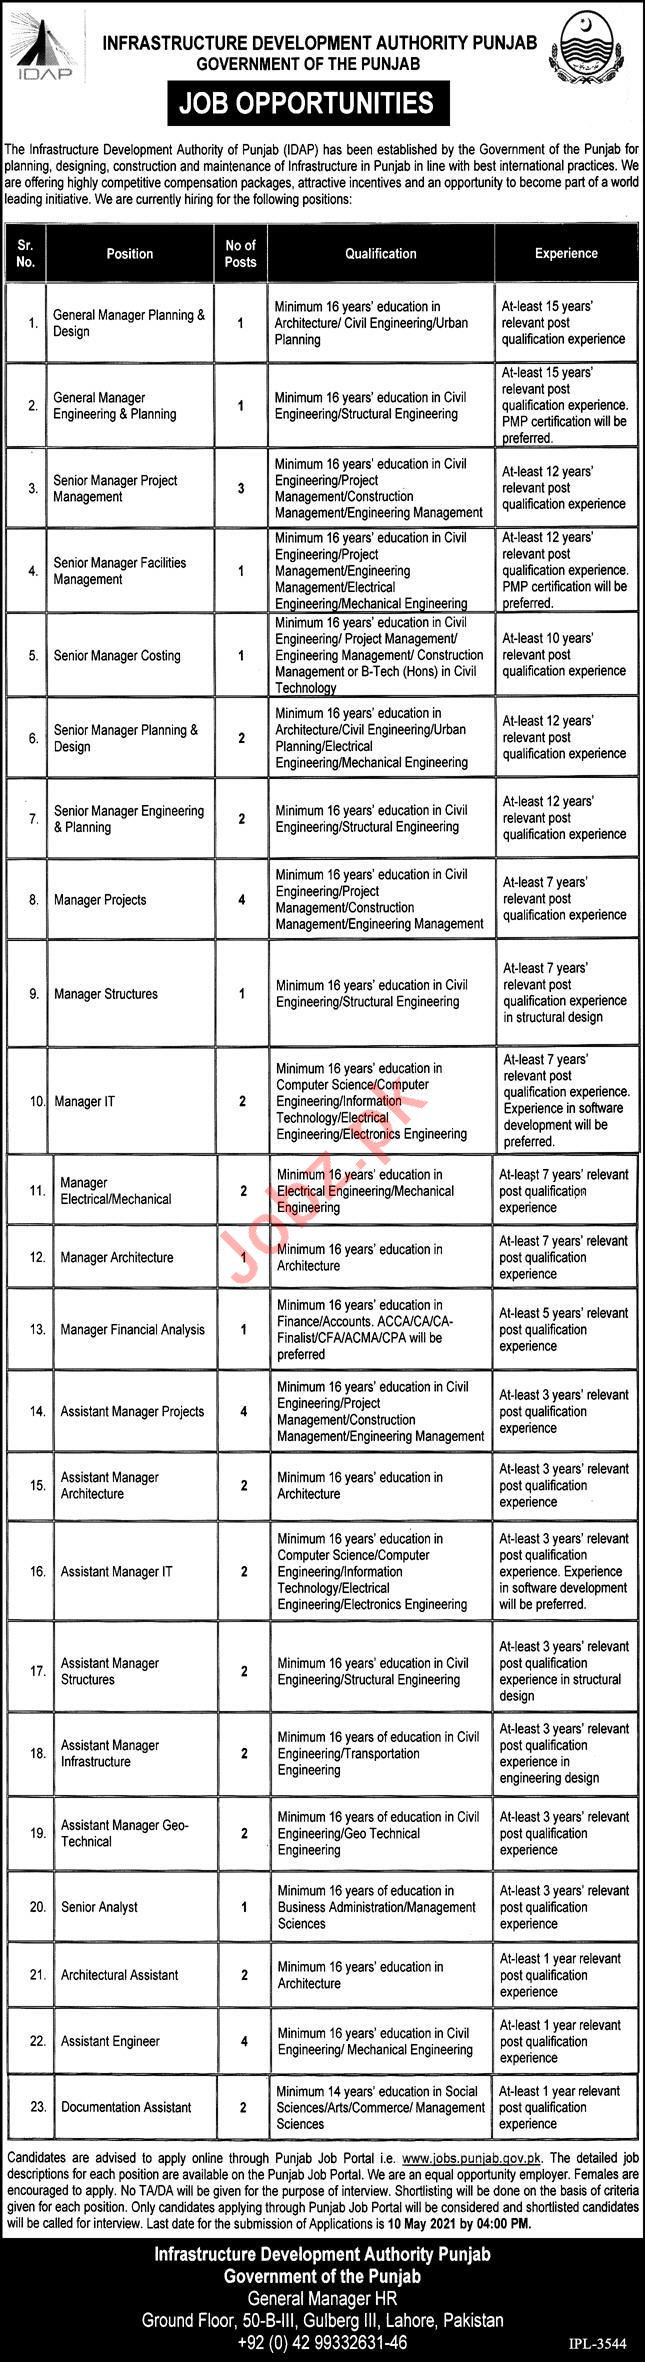 Infrastructure Development Authority Punjab IDAP Jobs 2021